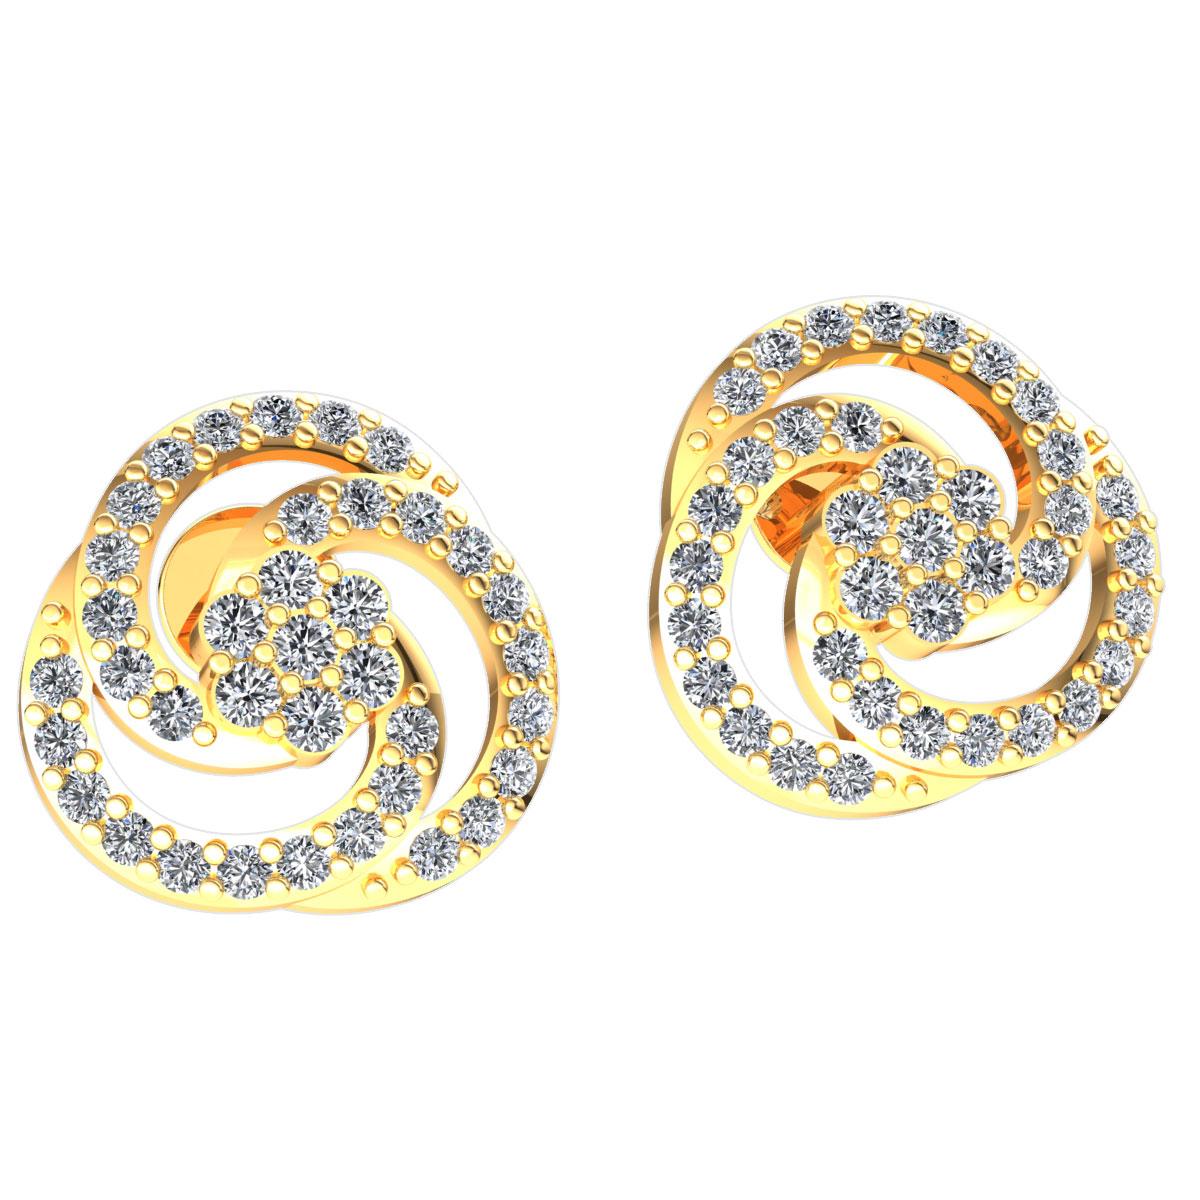 Genuine 0.4ct Round Cut Diamond Ladies Trinity Knot Earrings Solid 18K gold